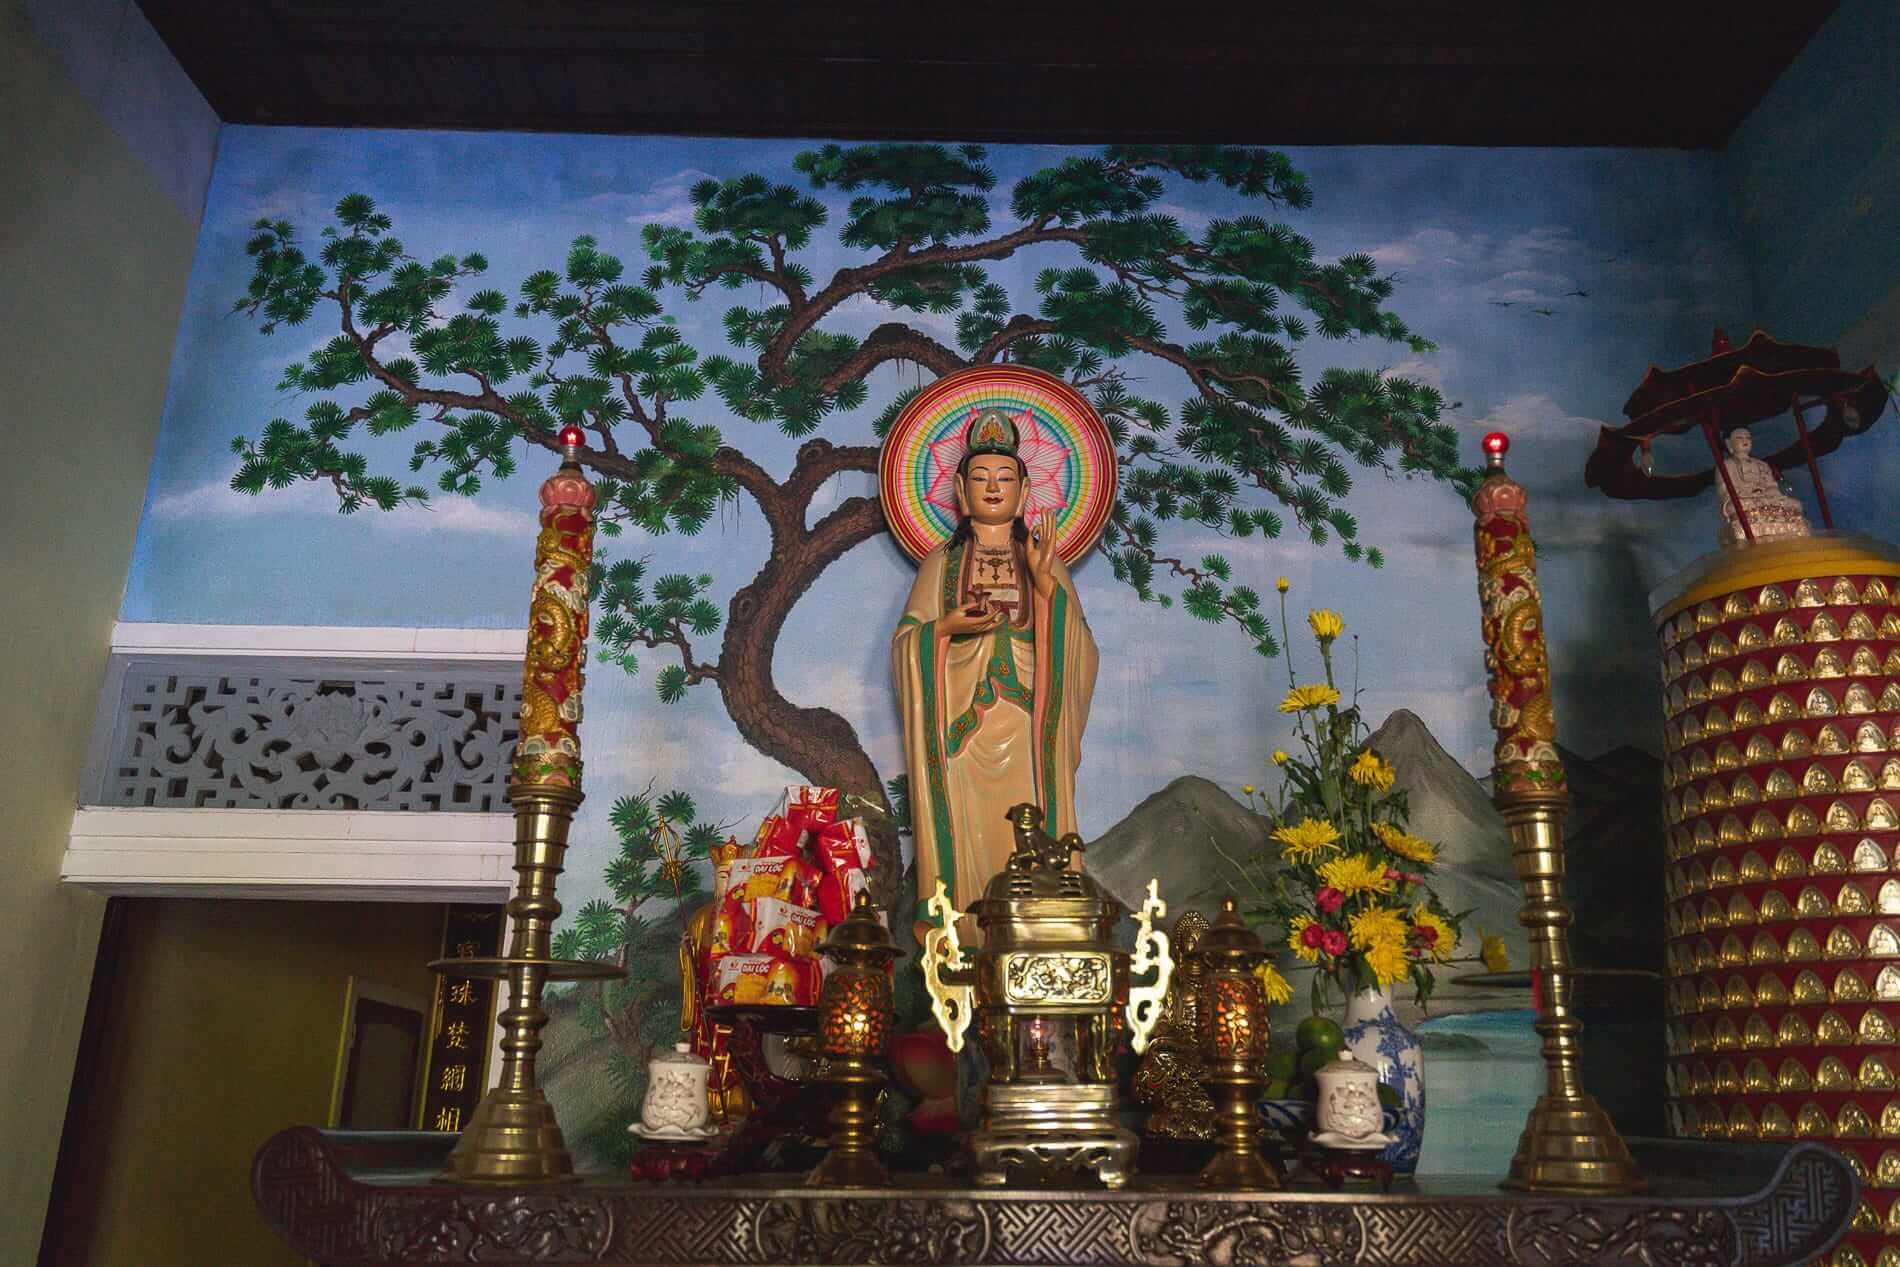 A small side altar - Hoi An Temples and Pagodas